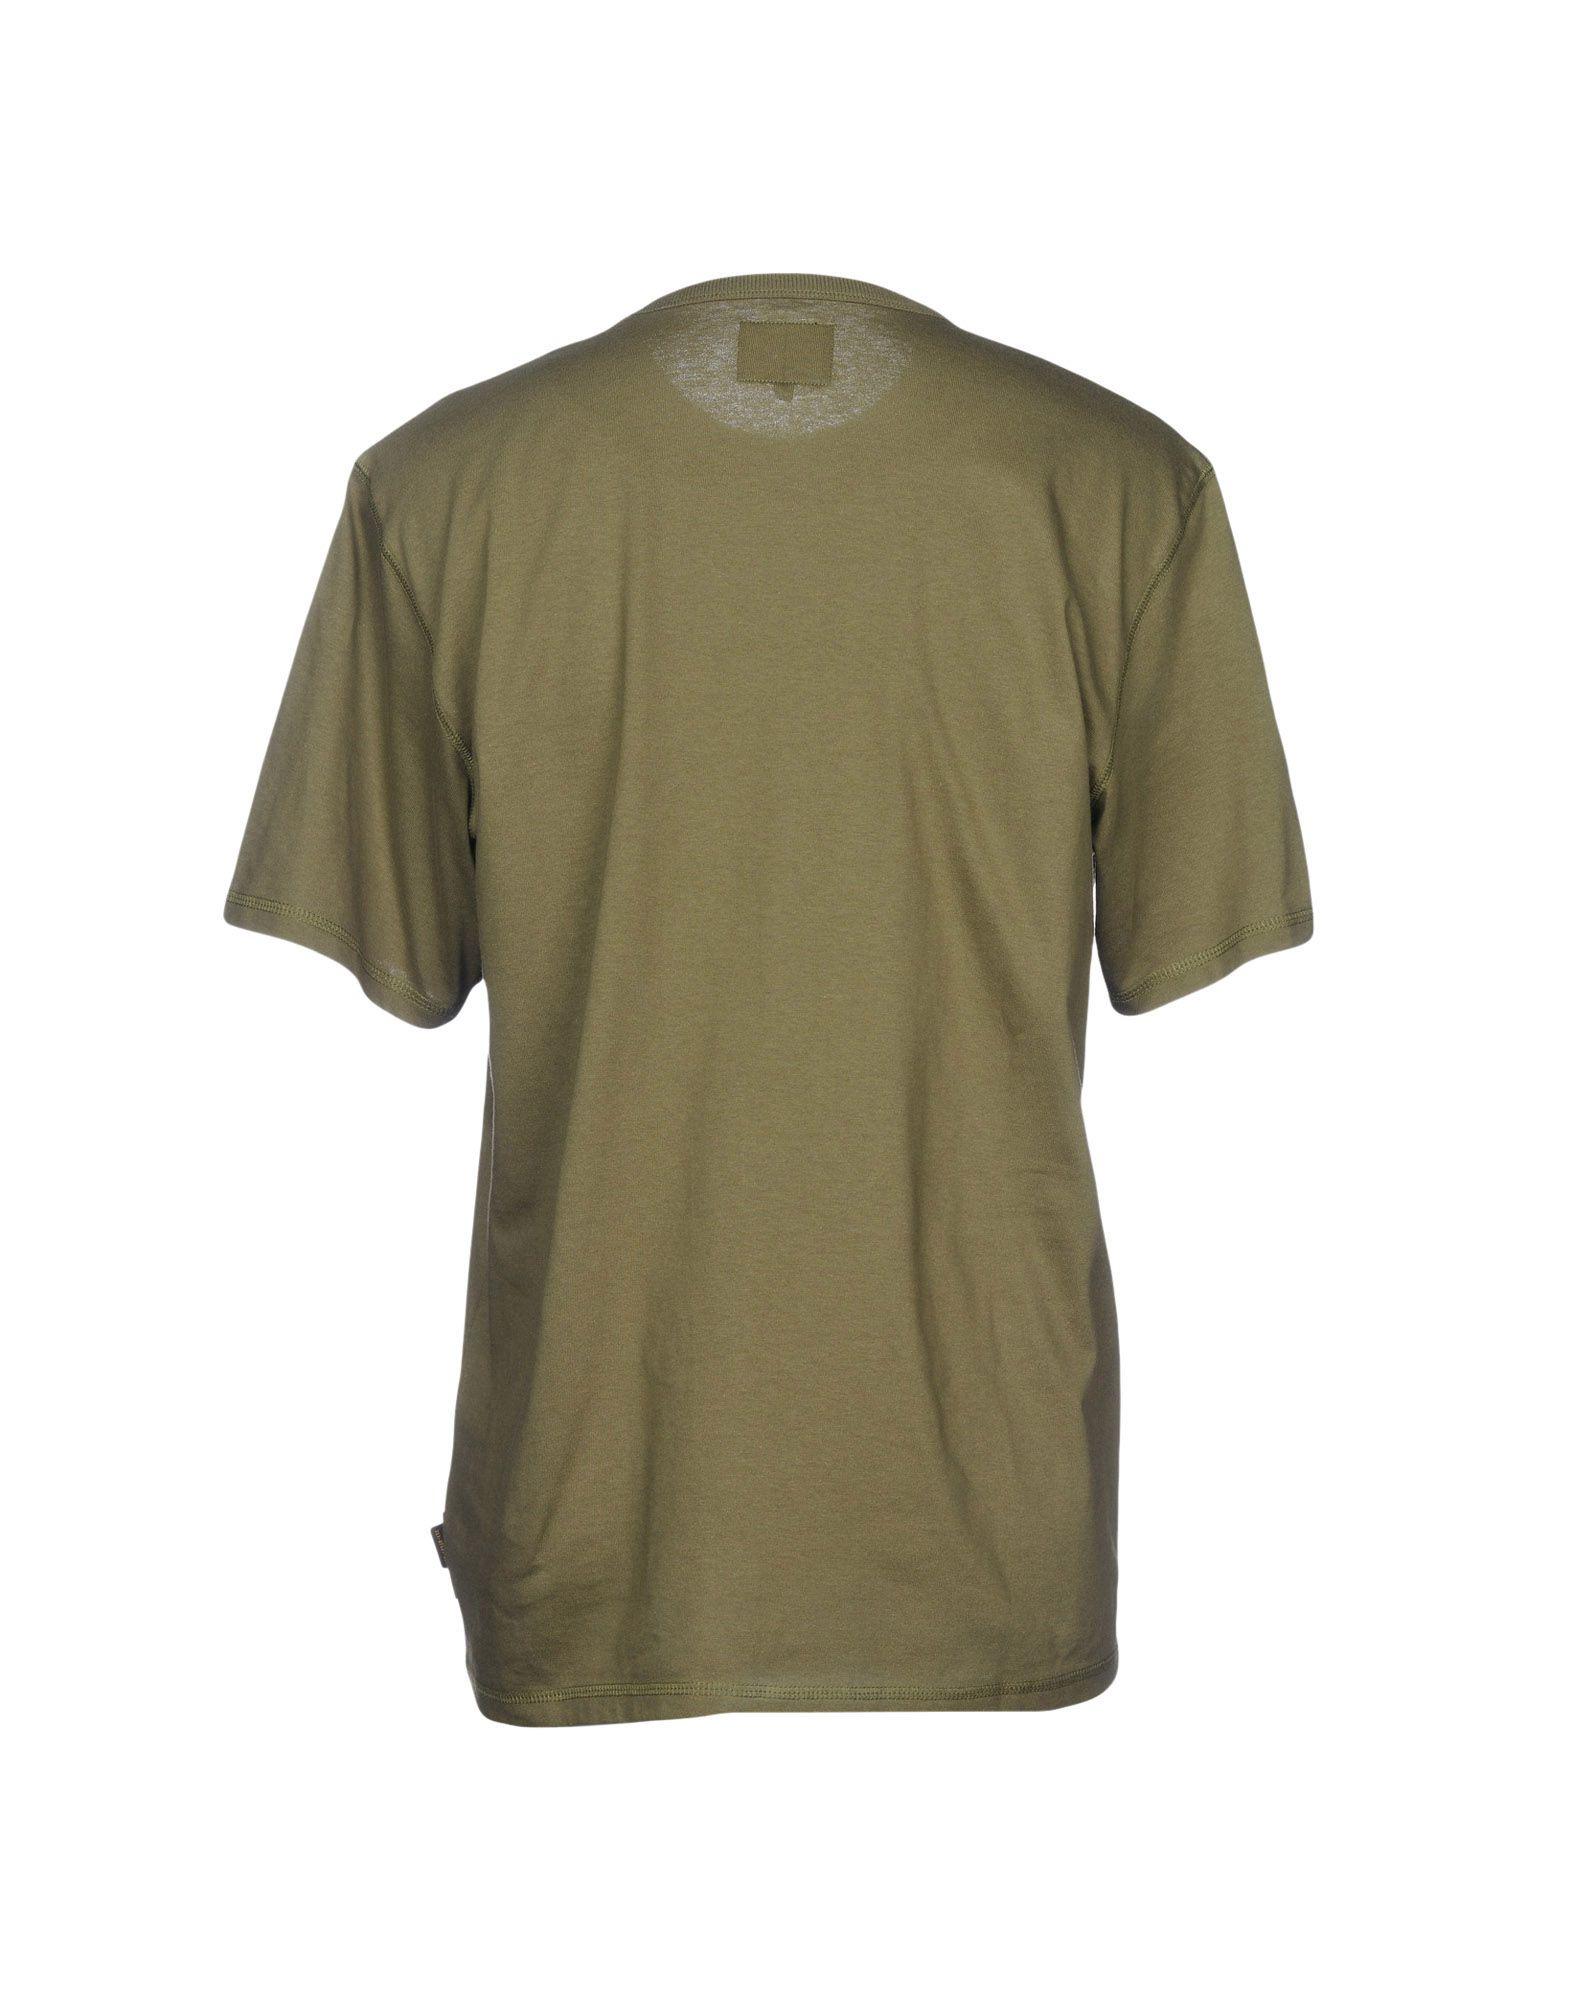 A buon mercato A buon mercato mercato buon T-Shirt Carhartt Uomo - 12179380UN 8d3aa3